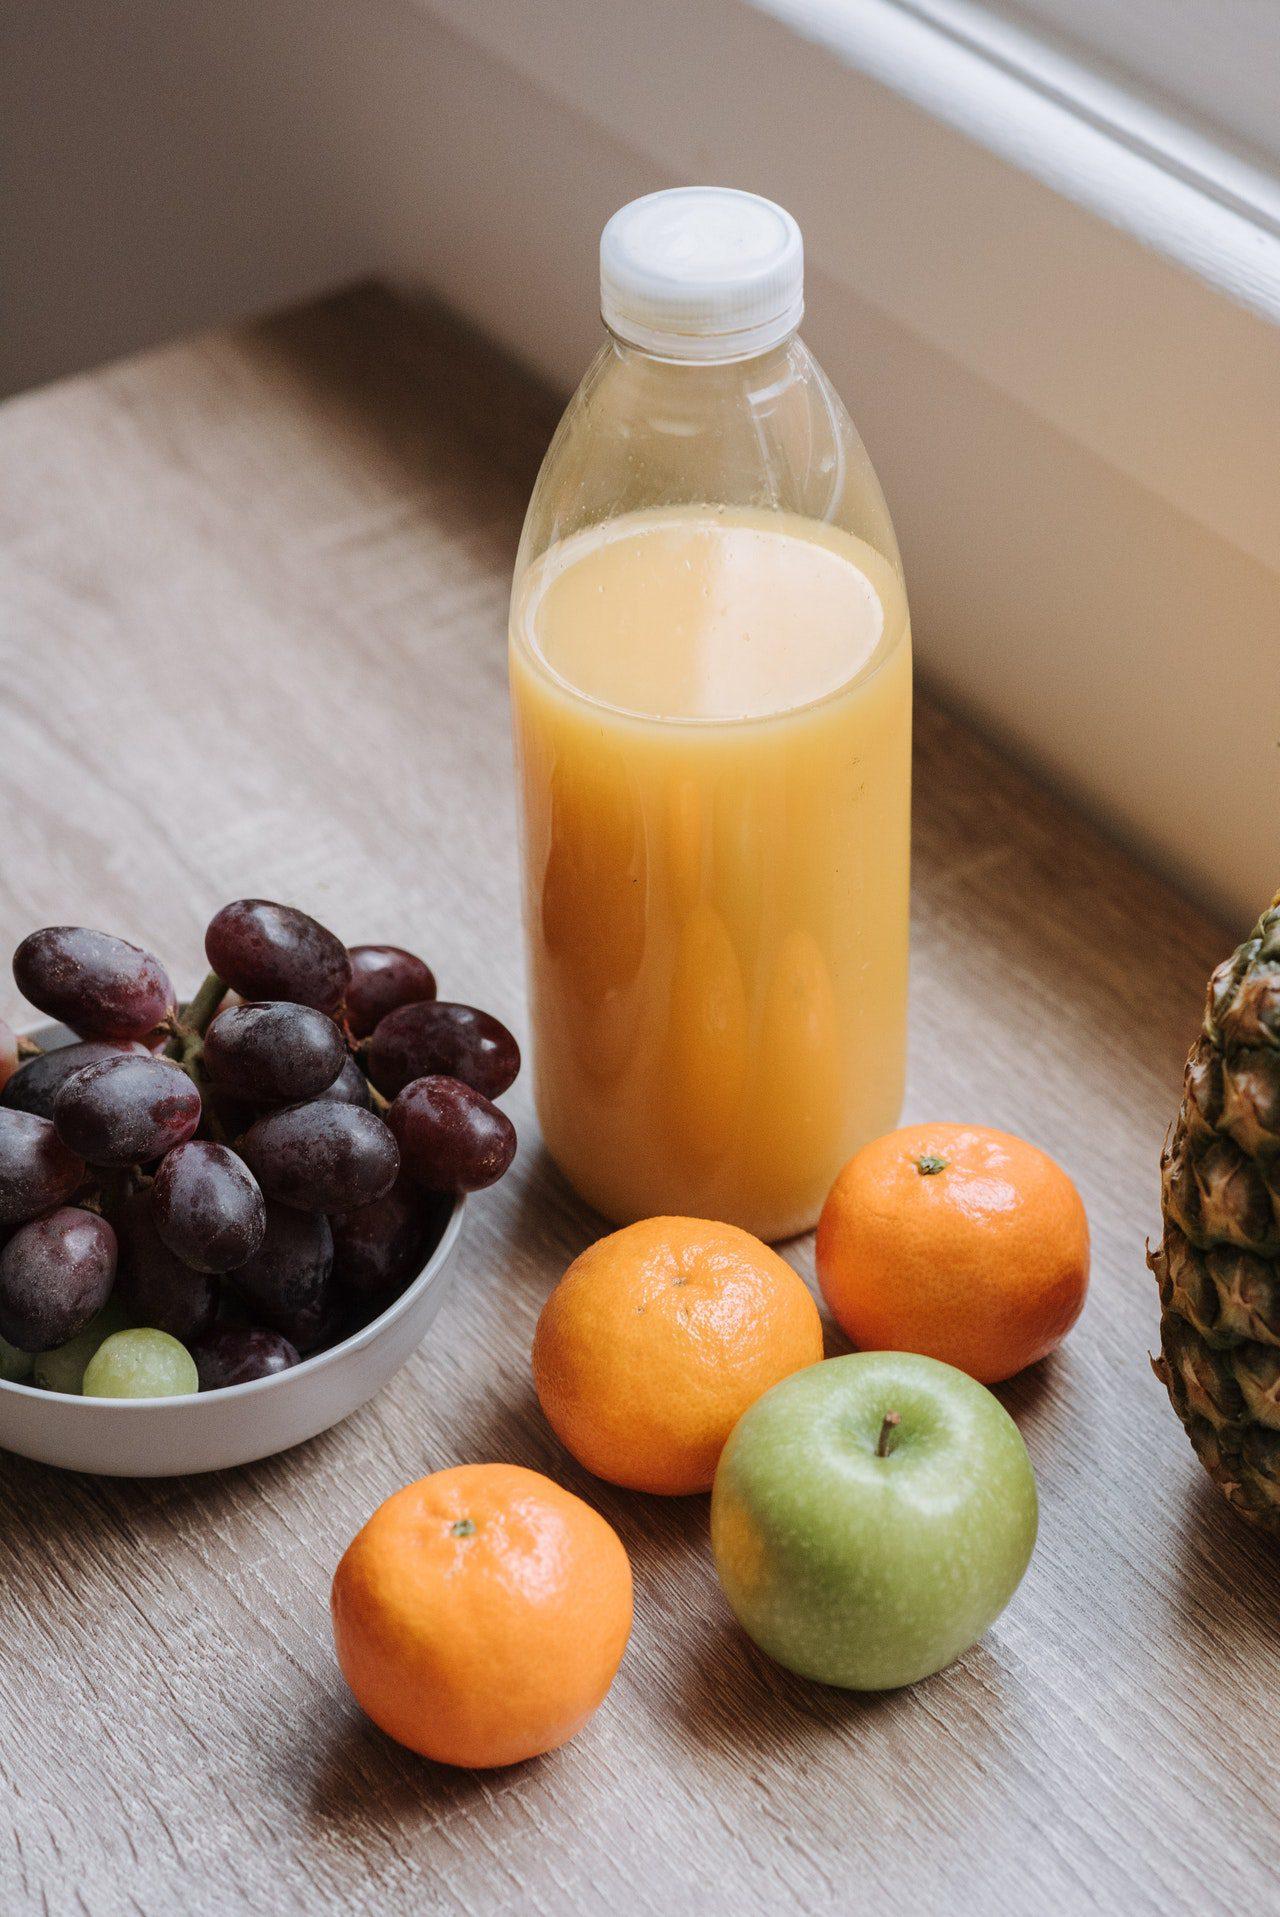 Is Sunny D Orange Juice?